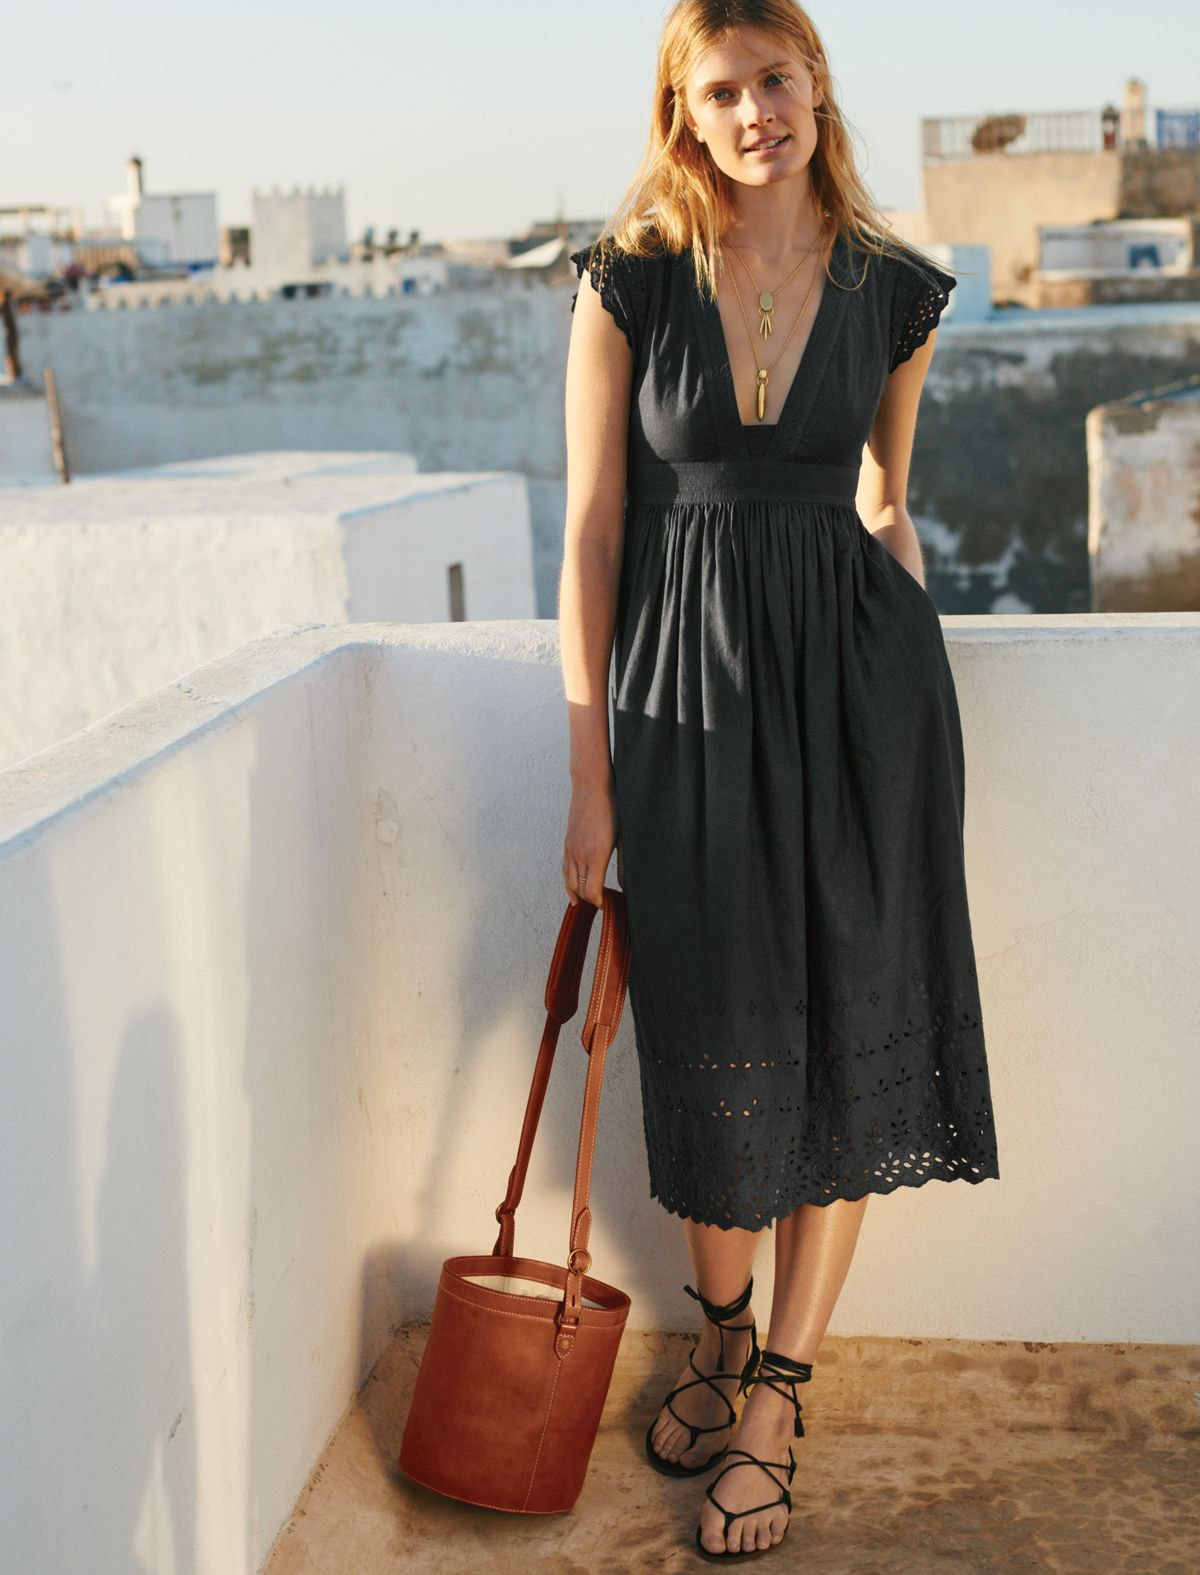 573e6b93e99 madewell eyelet nightbreeze dress worn with the rivet   thread bucket bag +  boardwalk sandal.  everydaymadewell